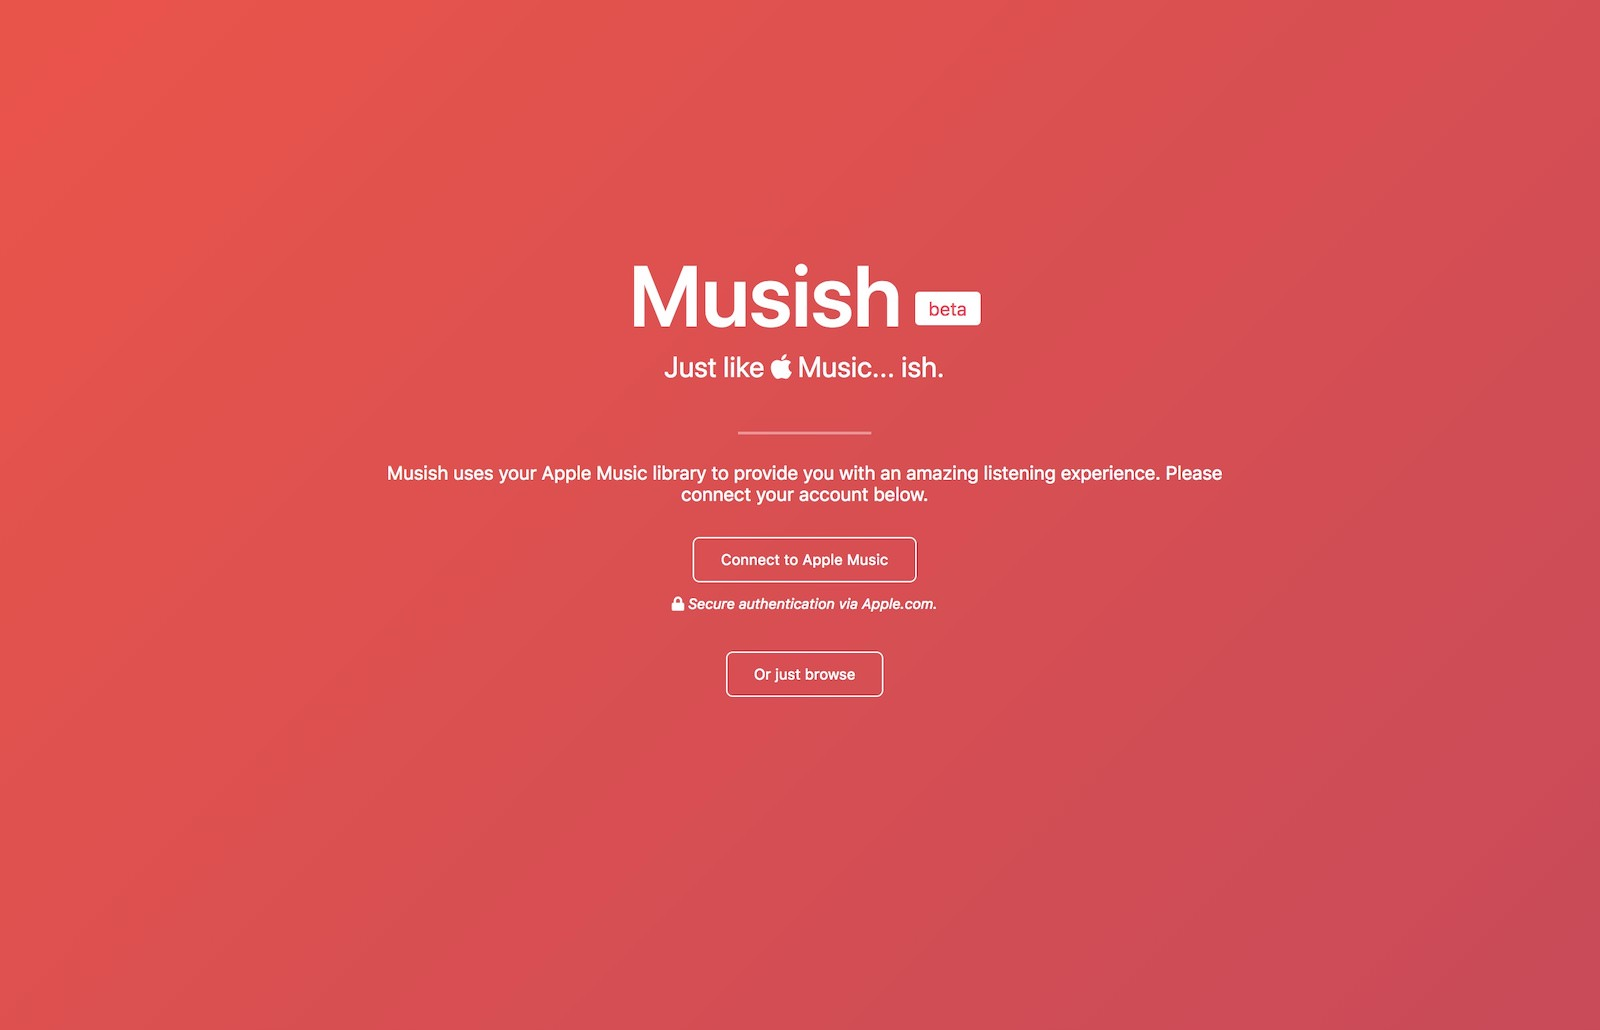 Musish apple music service 1